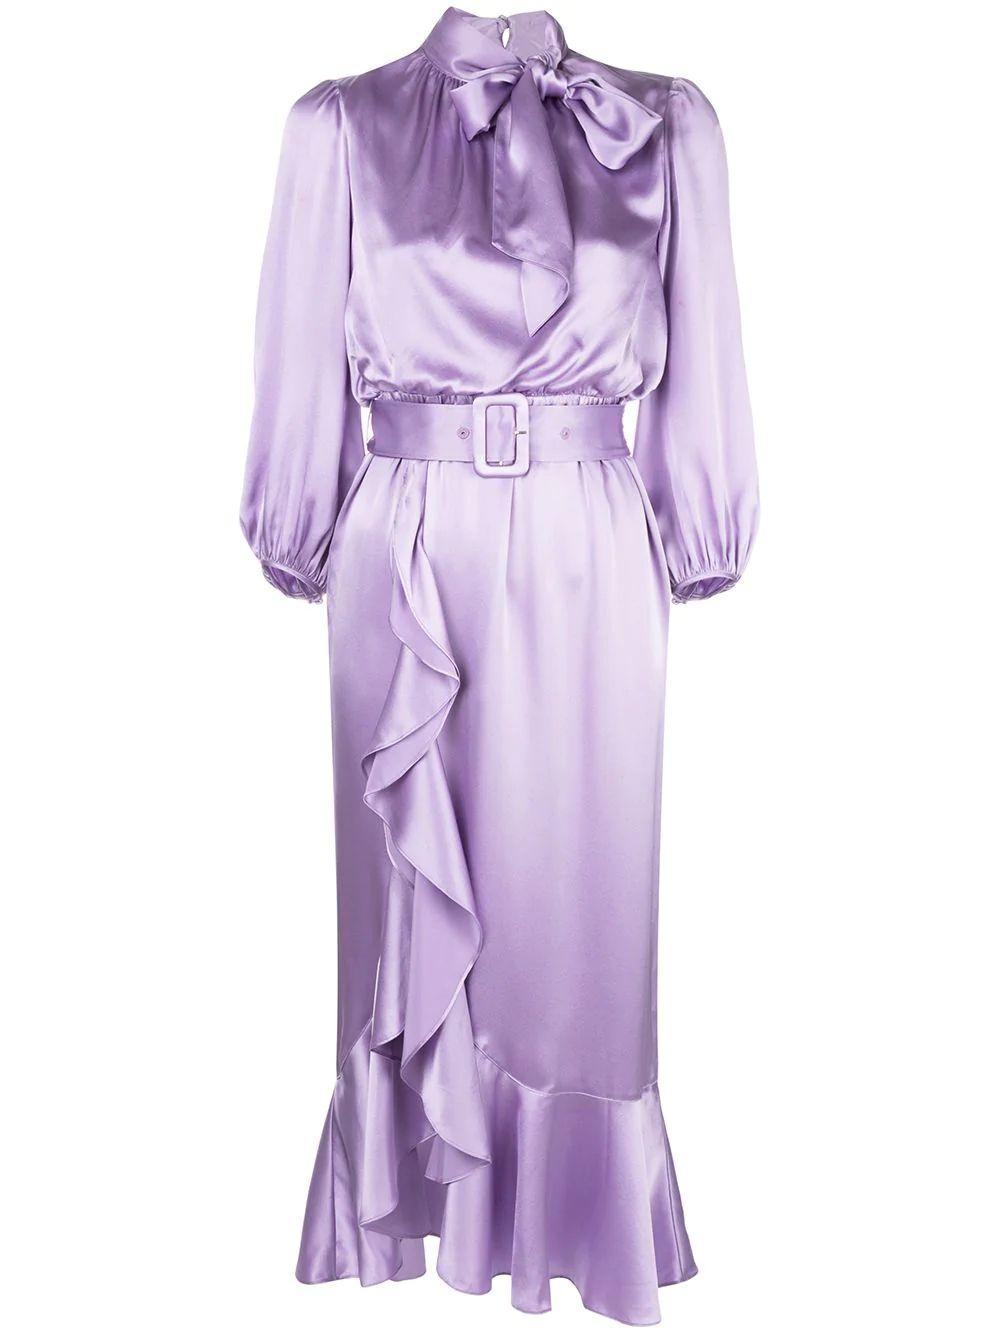 Bella Long Sleeve Dress